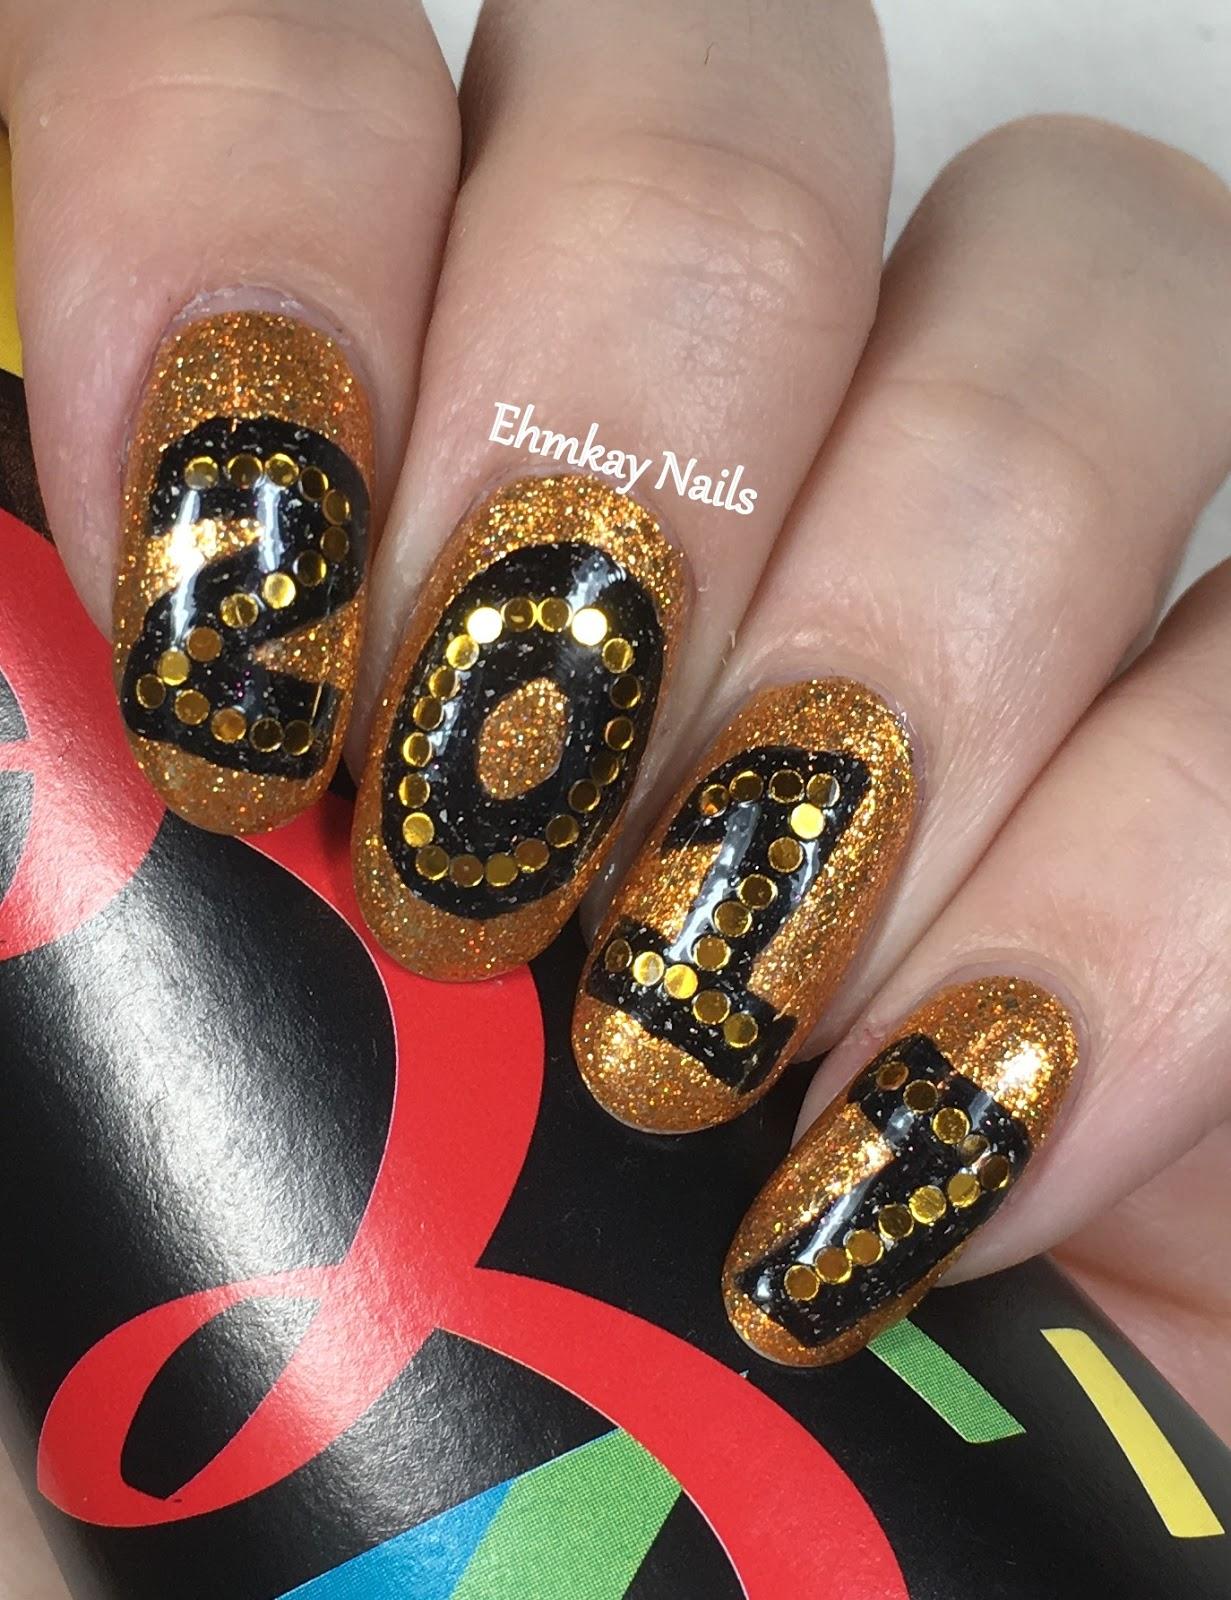 Ehmkay Nails: Welcome To 2017 Nail Art